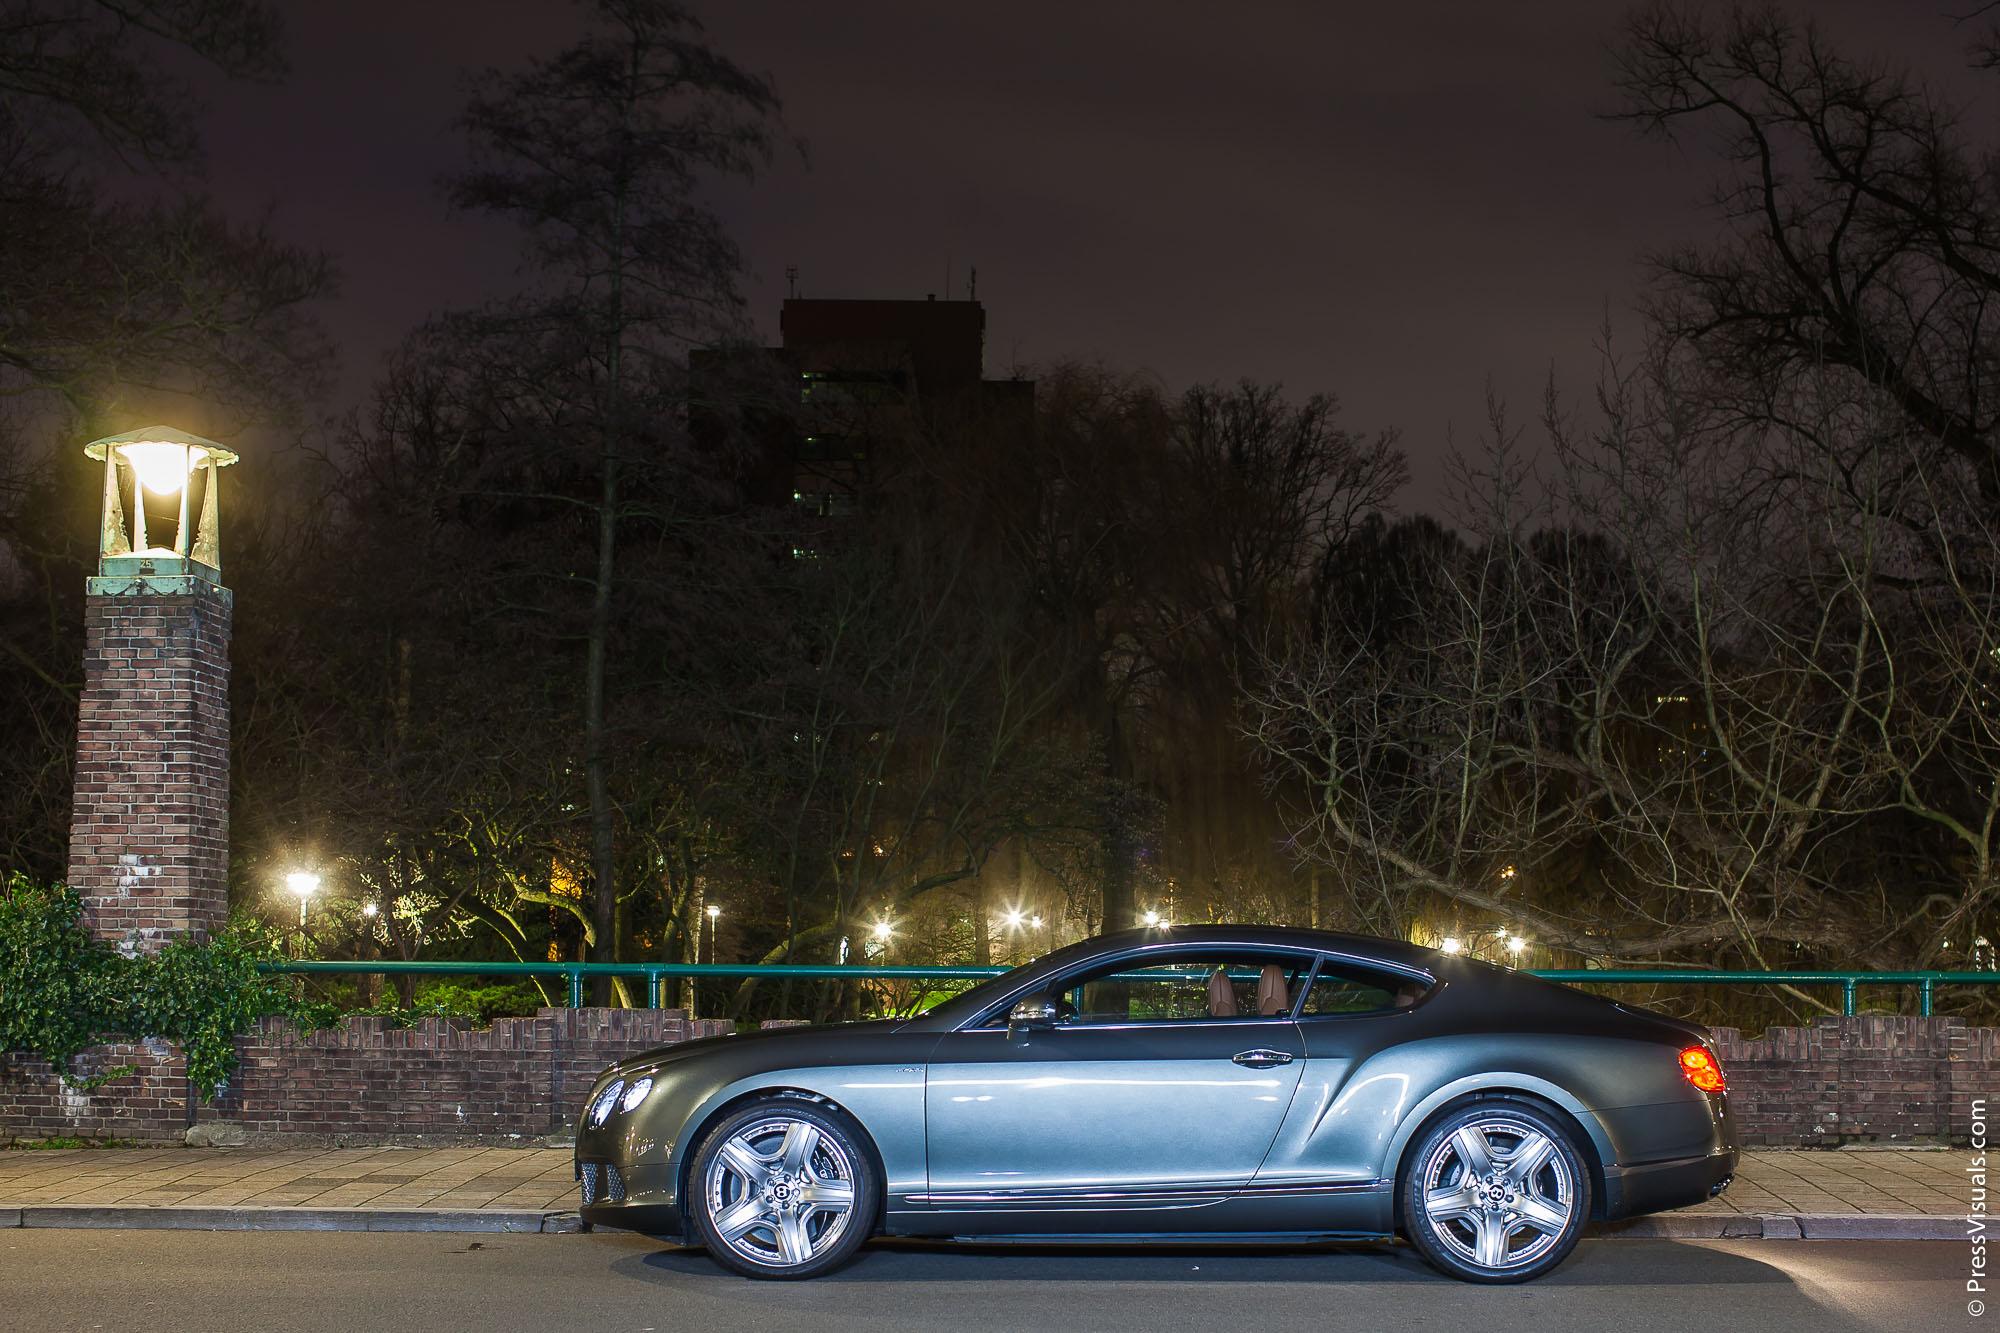 Bentley Continental GT 6.0 W12 Mulliner | Auto Advance | De Elzent - Eindhoven